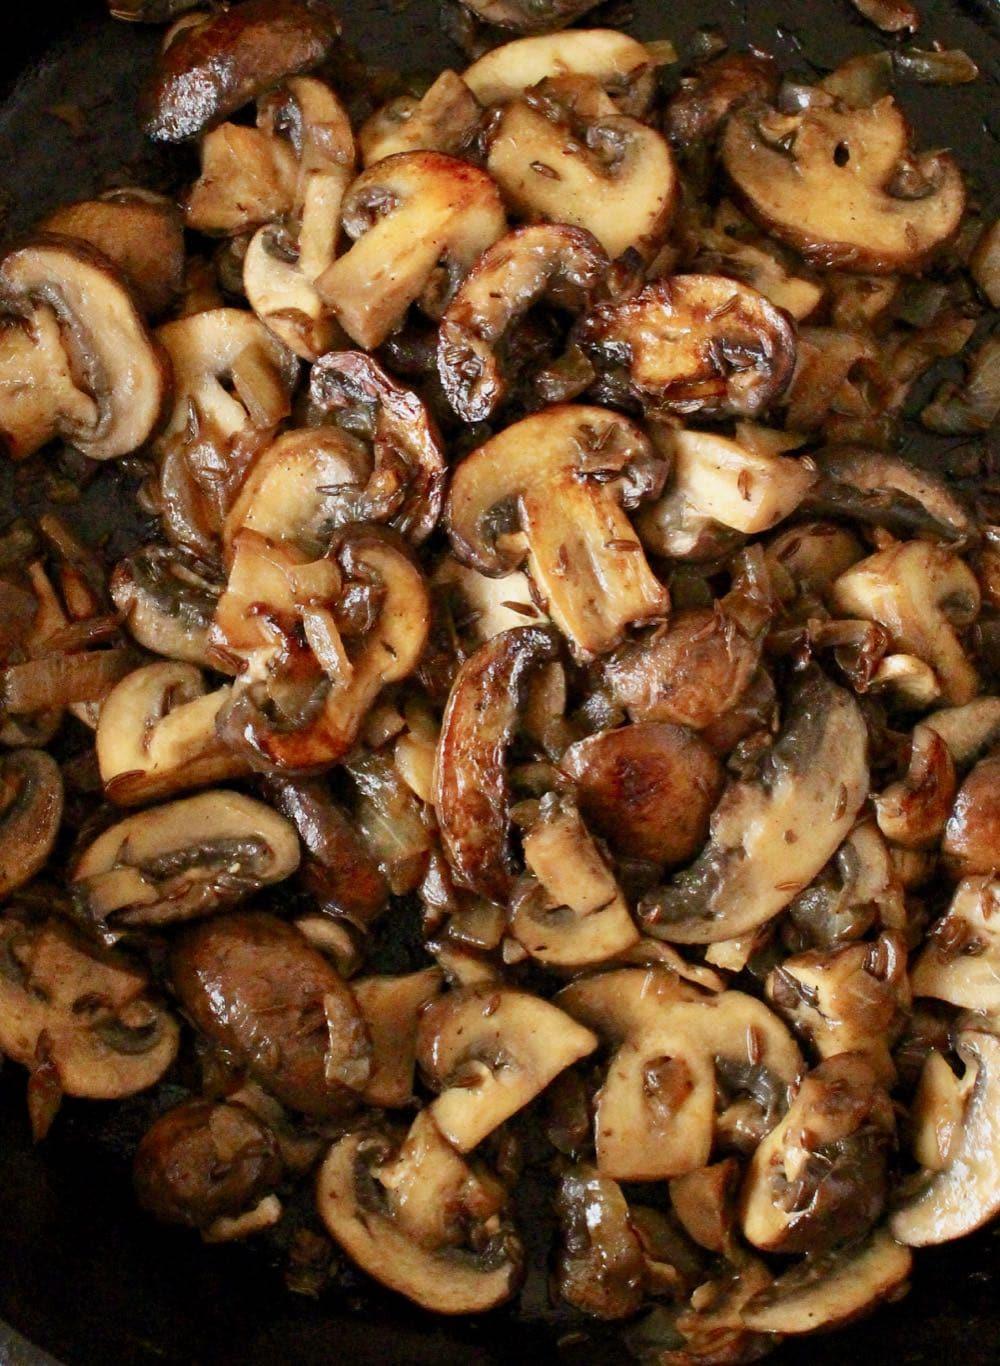 caramelized mushrooms in cast iron skillet